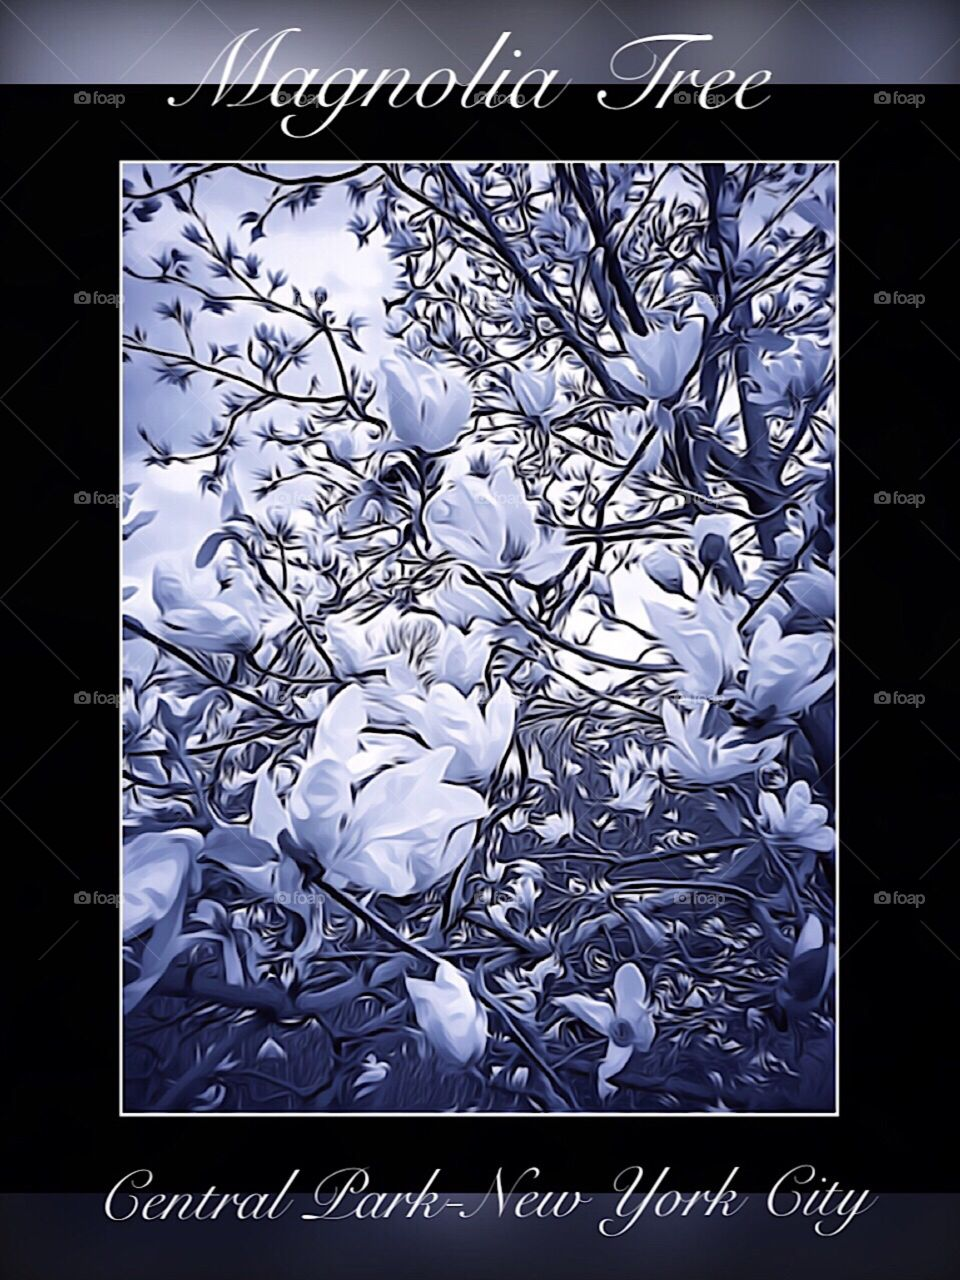 Magnolia Tree, Central Park-New York City. Instagram,@PennyPeronto